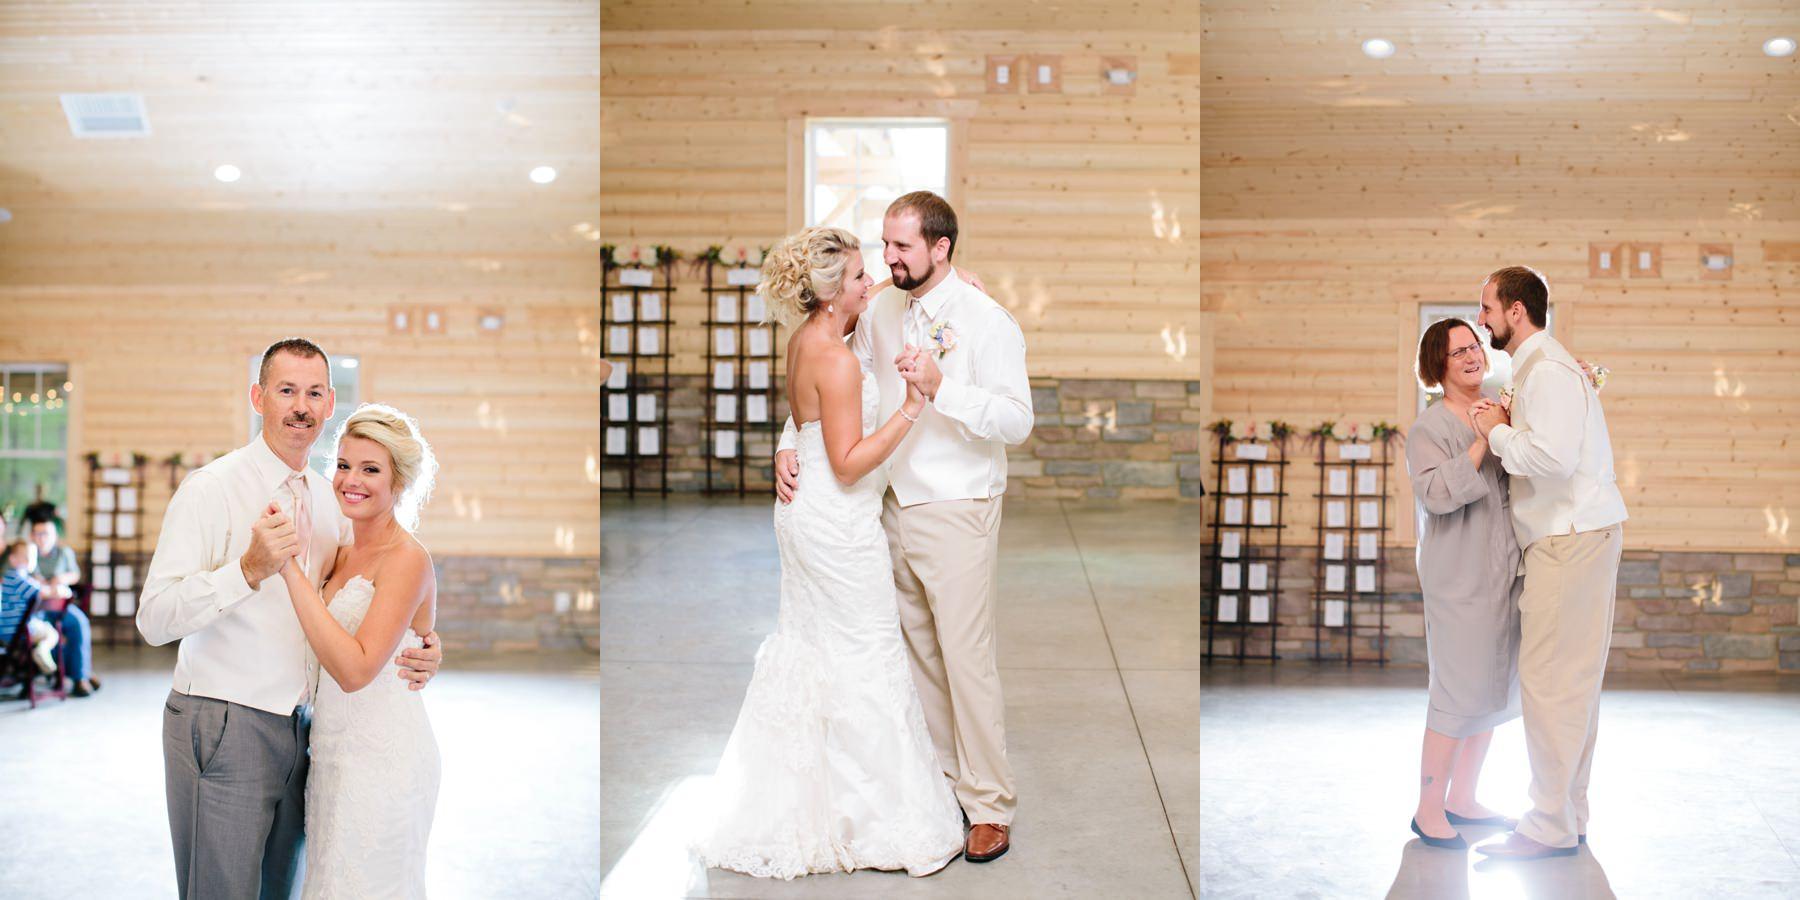 Tire Swing Photography | Timeless Charm Wedding | Camden, Ohio 41